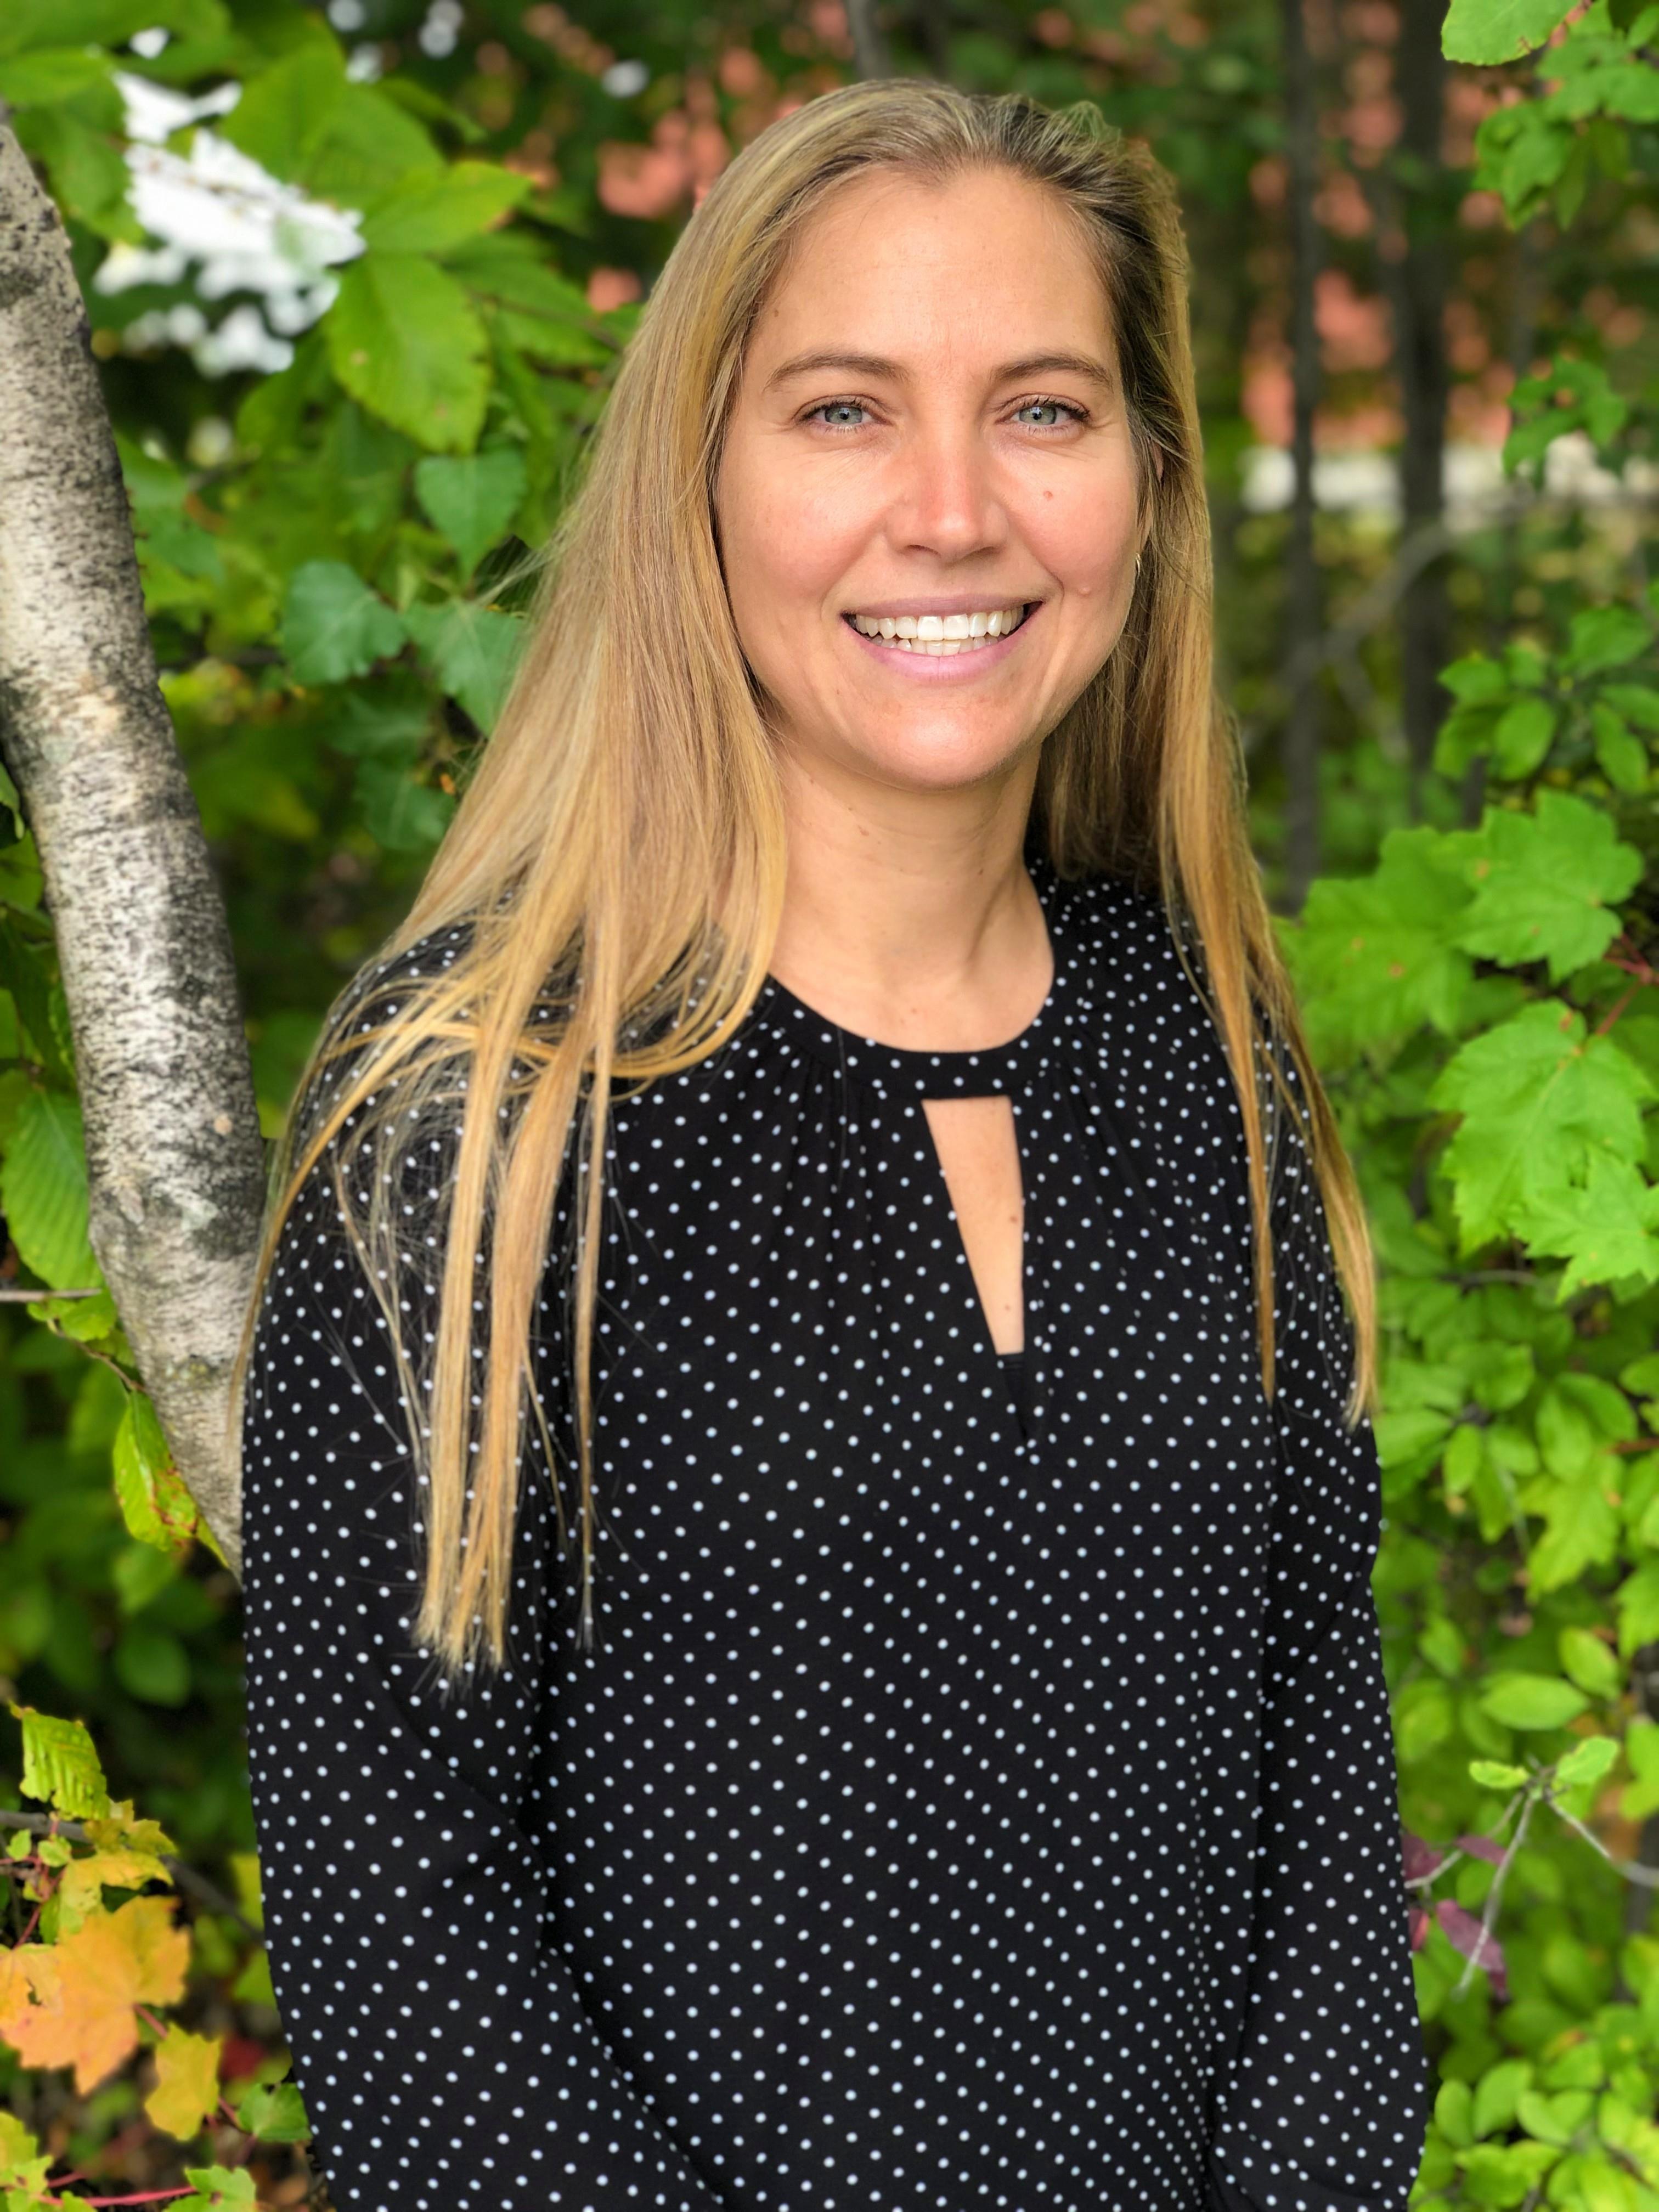 Caroline Dussault